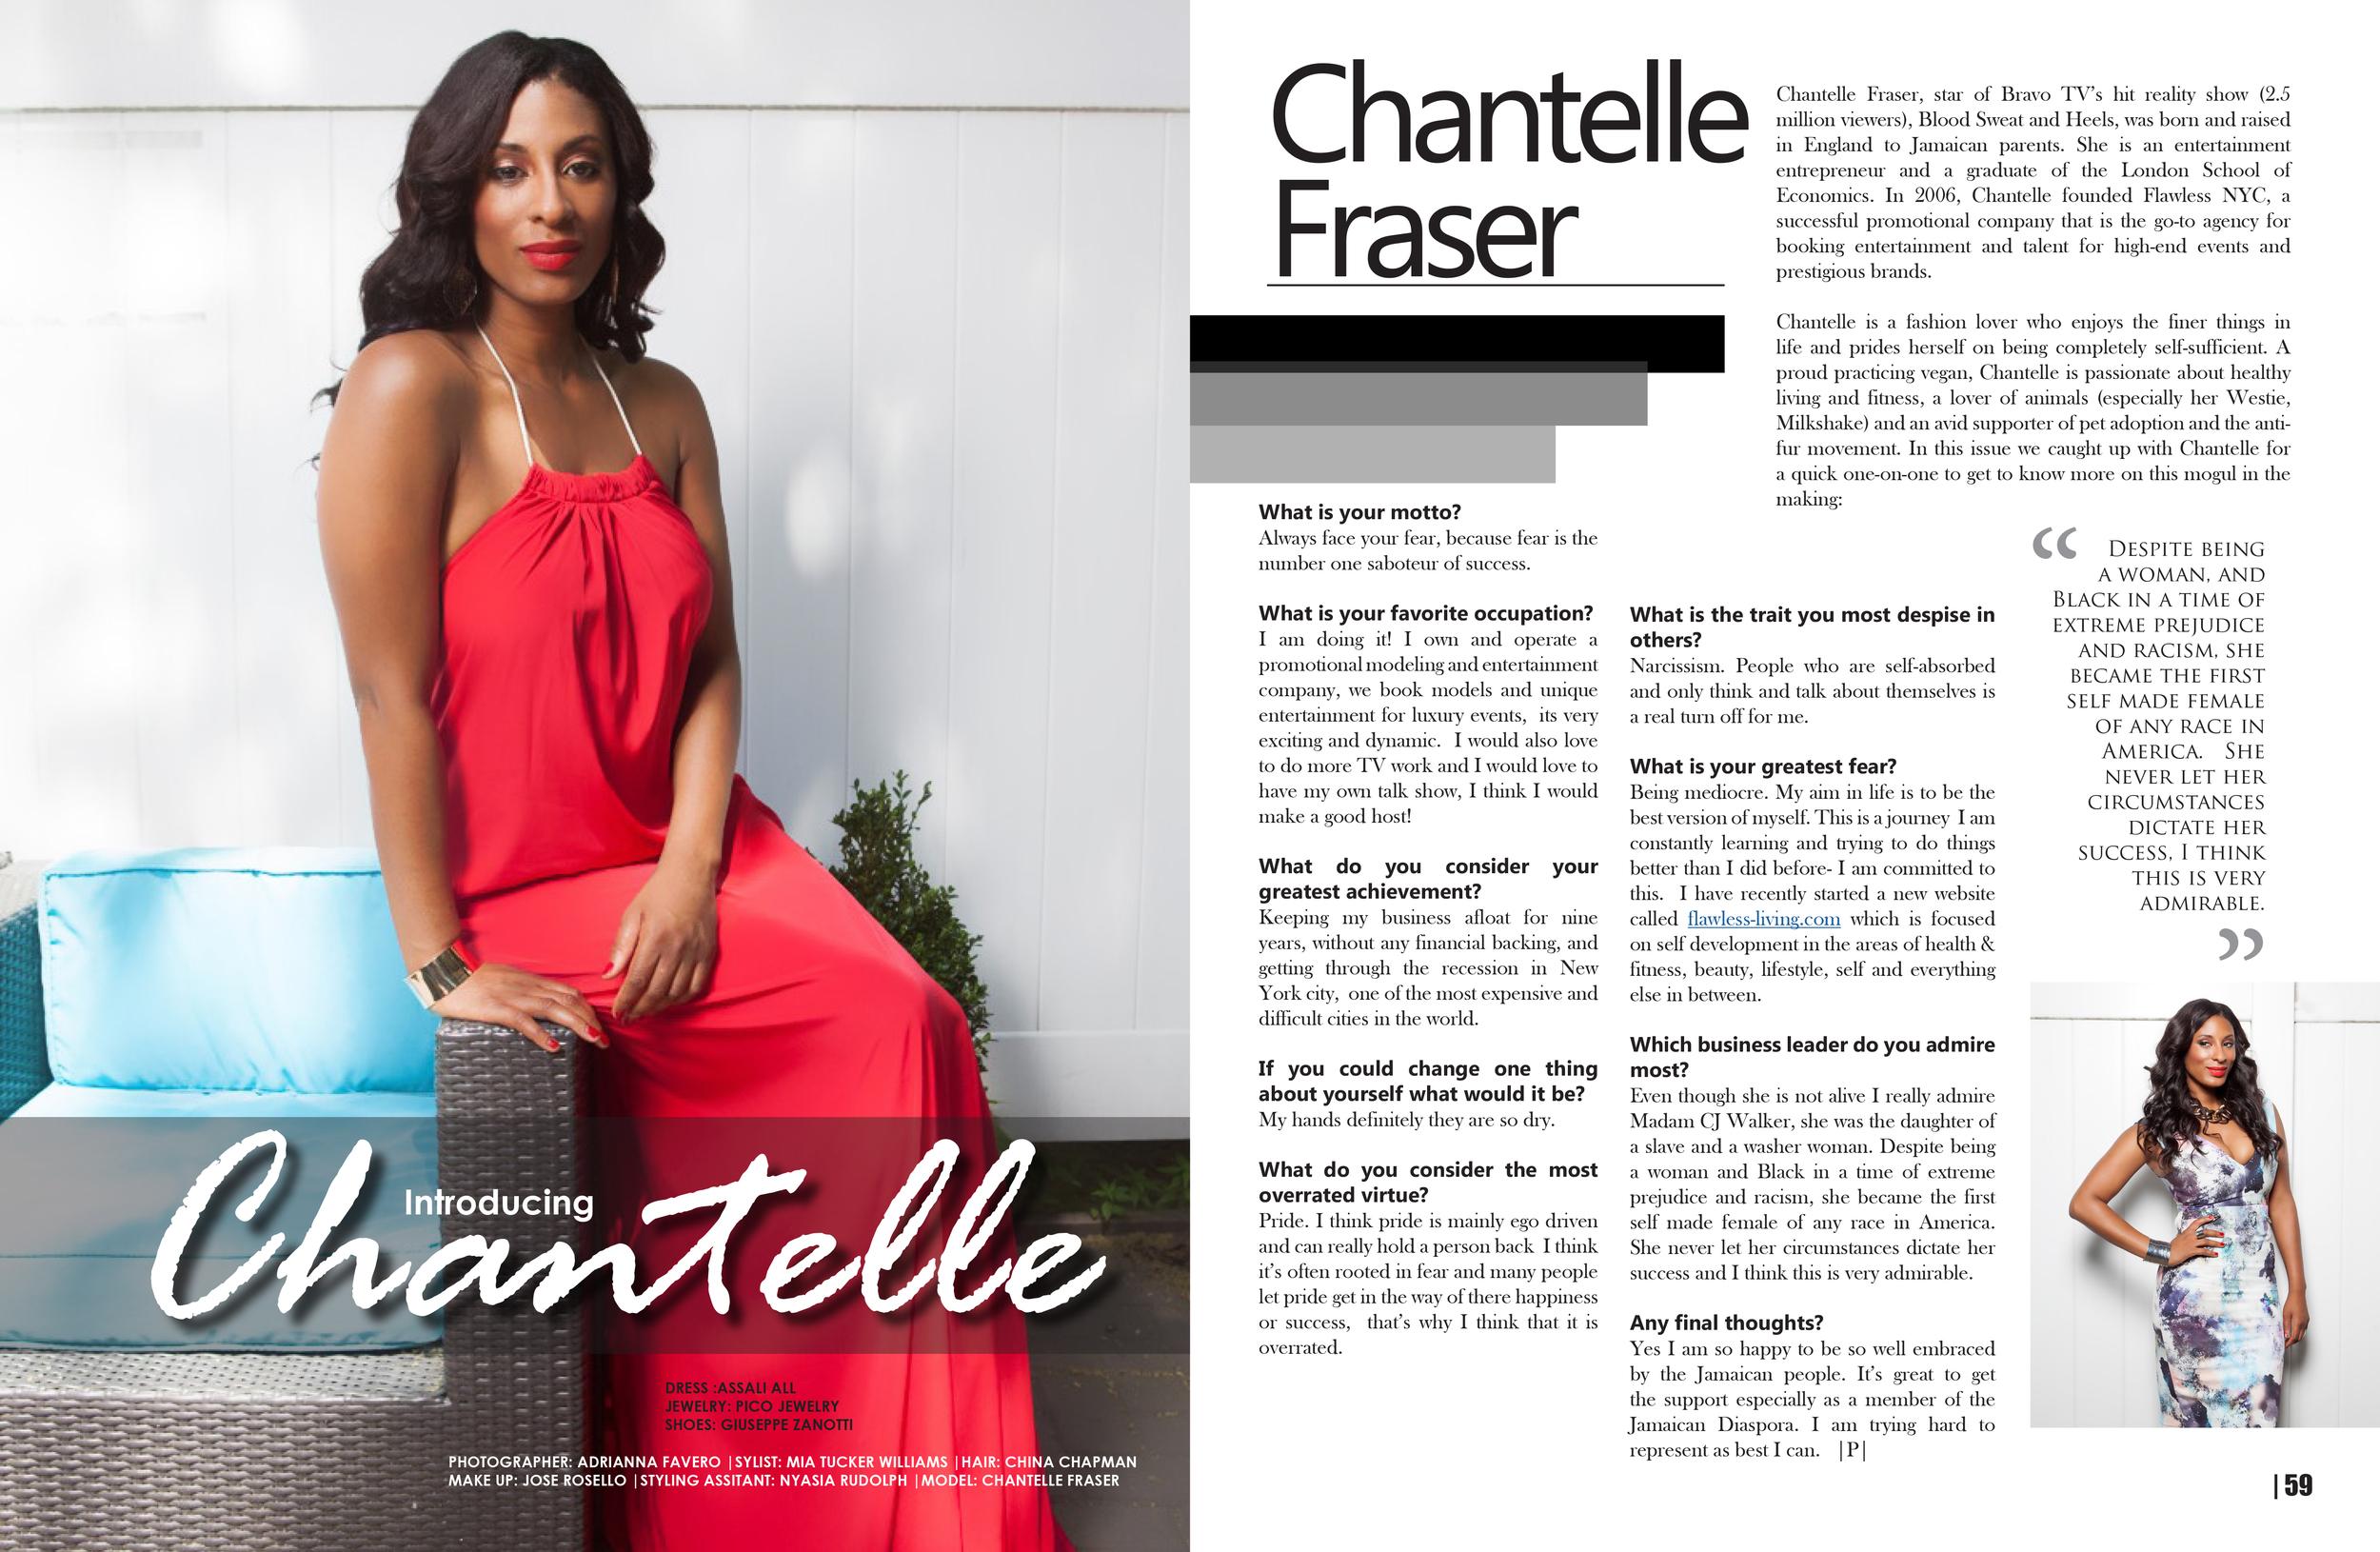 Favero_ChantelleFraser_Bravo_Panache1